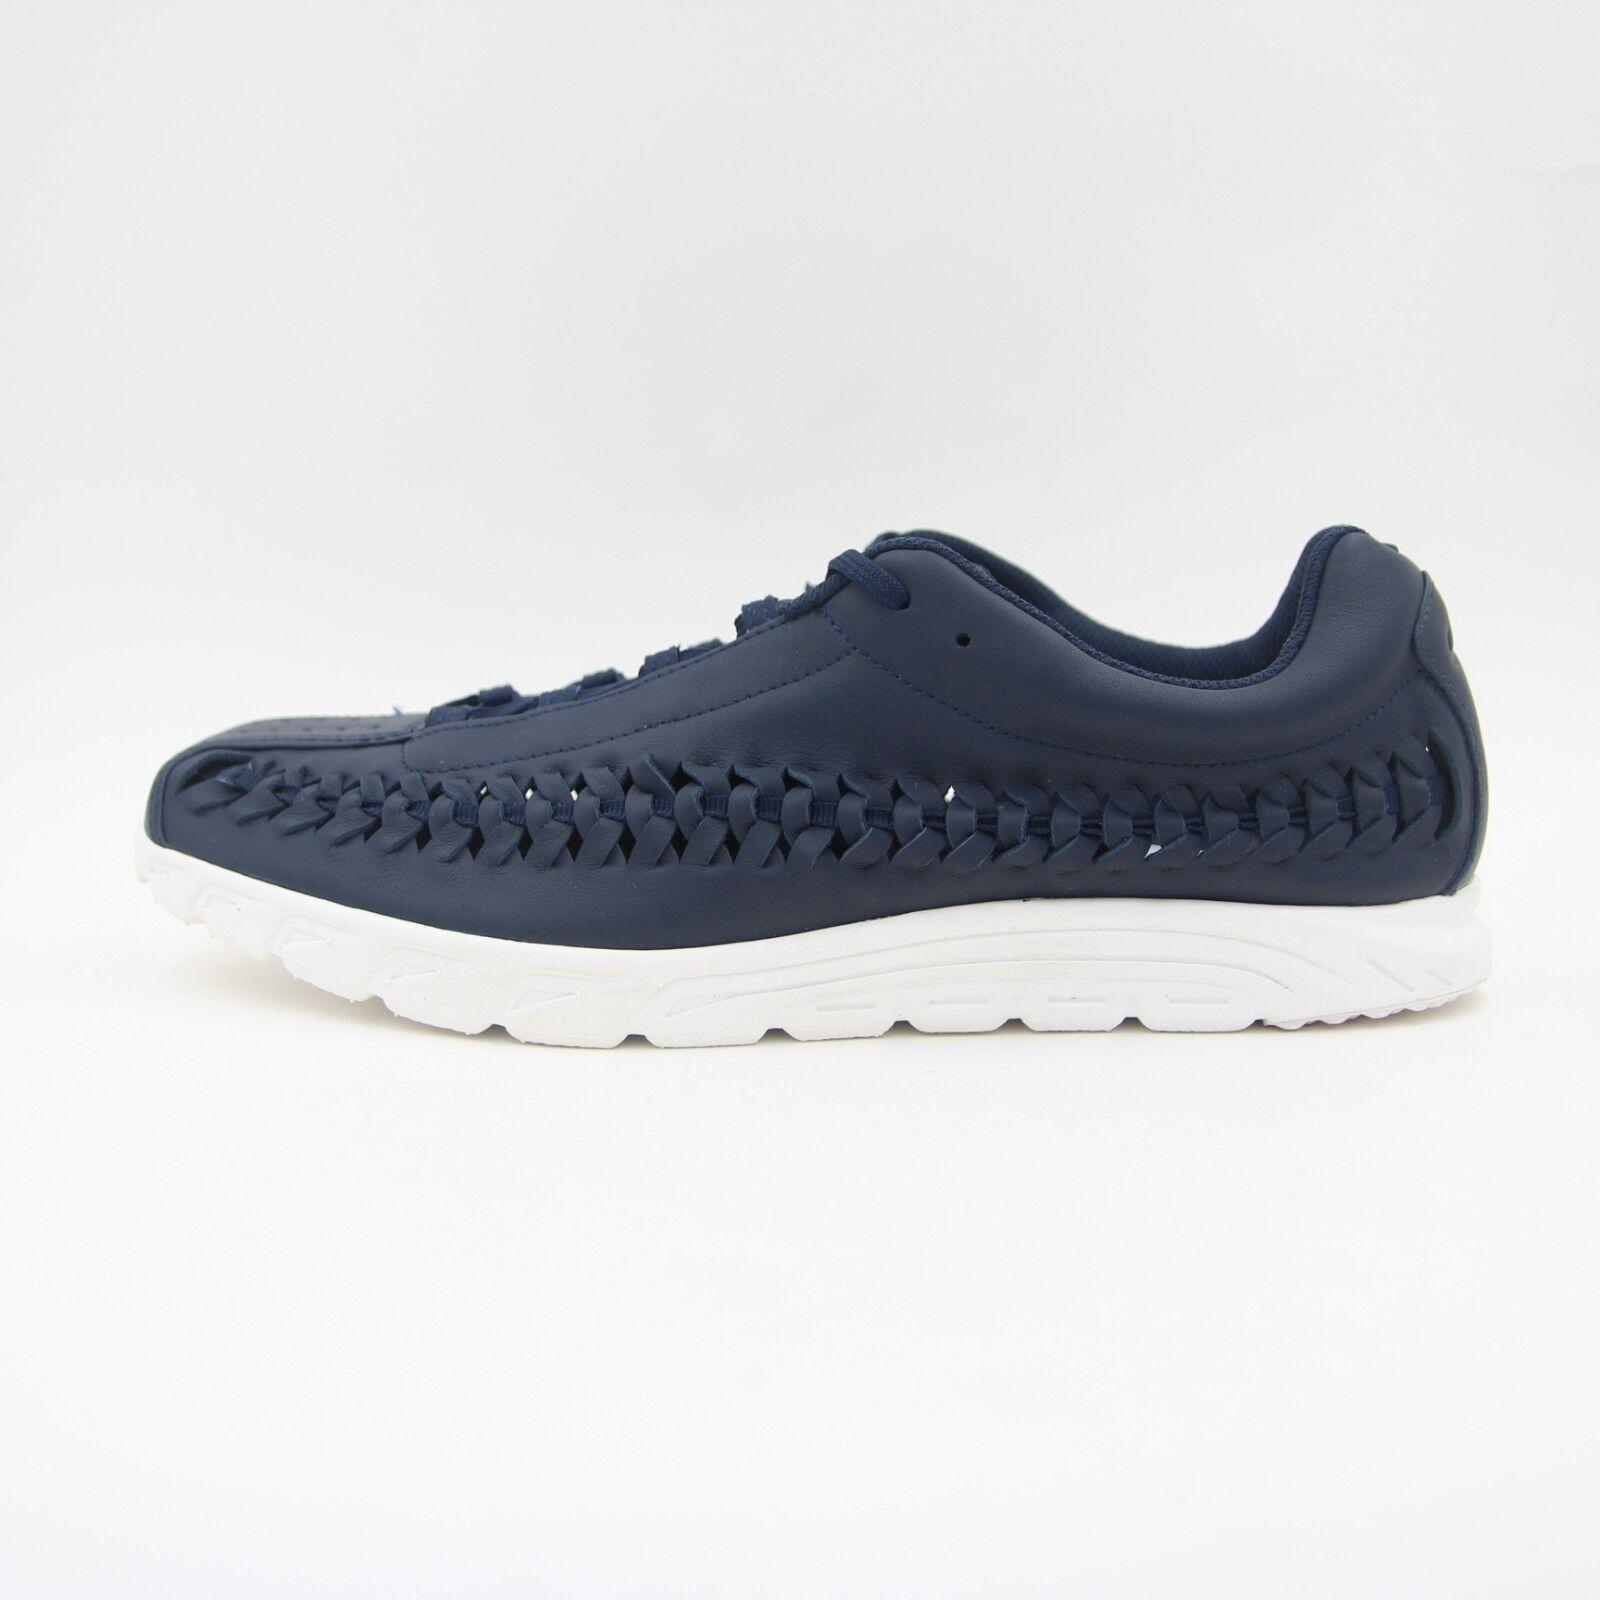 New  Uomo Nike Mayfly Blau Woven Leder Running Trainers Blau Mayfly UK 9.5 BNIB 833132 402 84144a